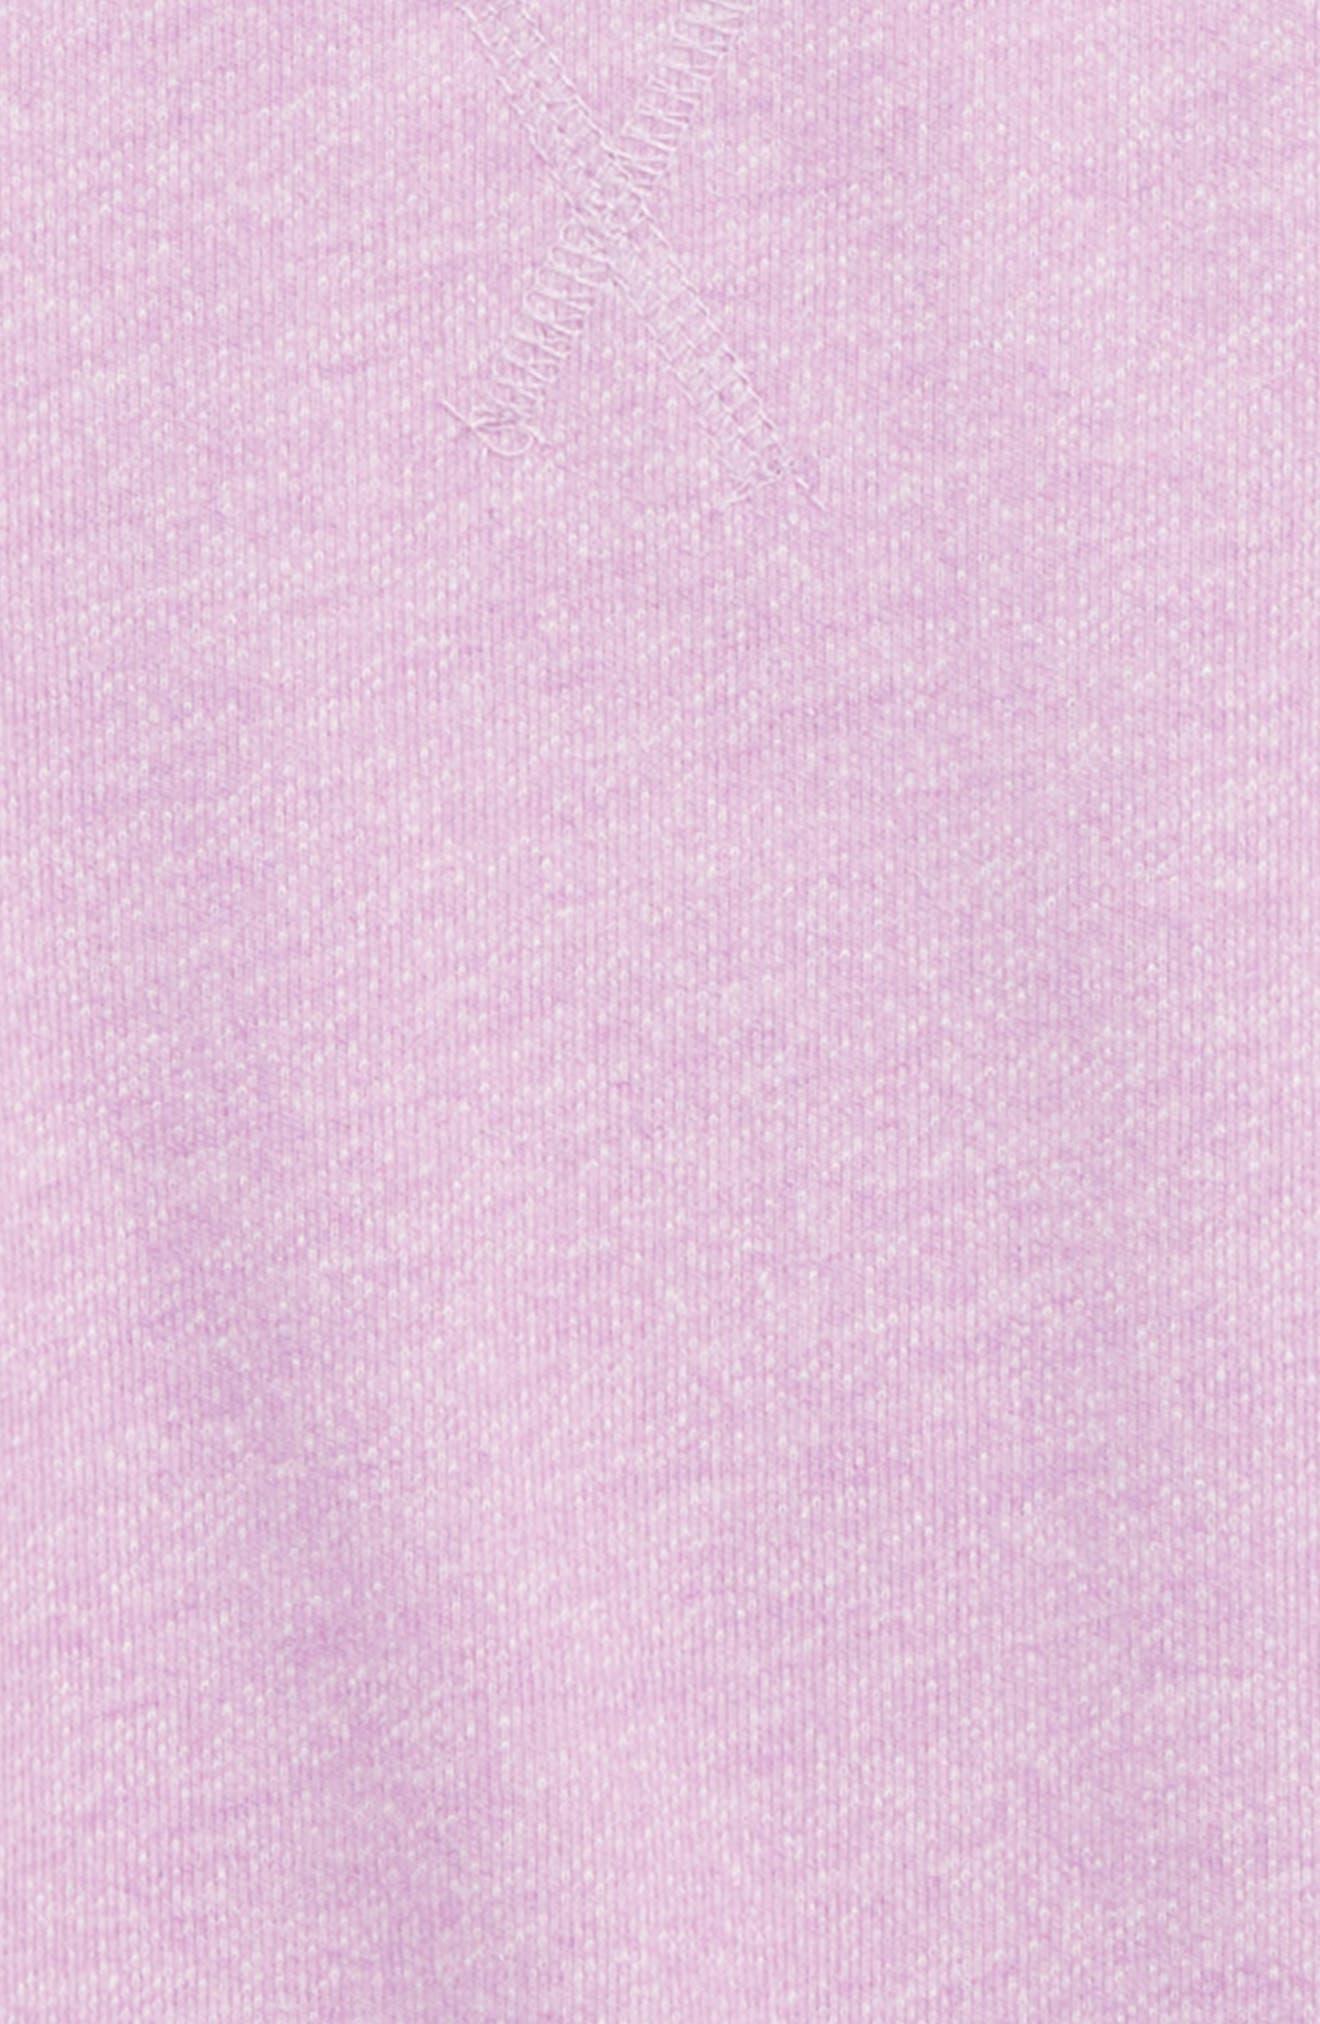 Crewneck Sweatshirt,                             Alternate thumbnail 2, color,                             SUNDRENCHED POOL